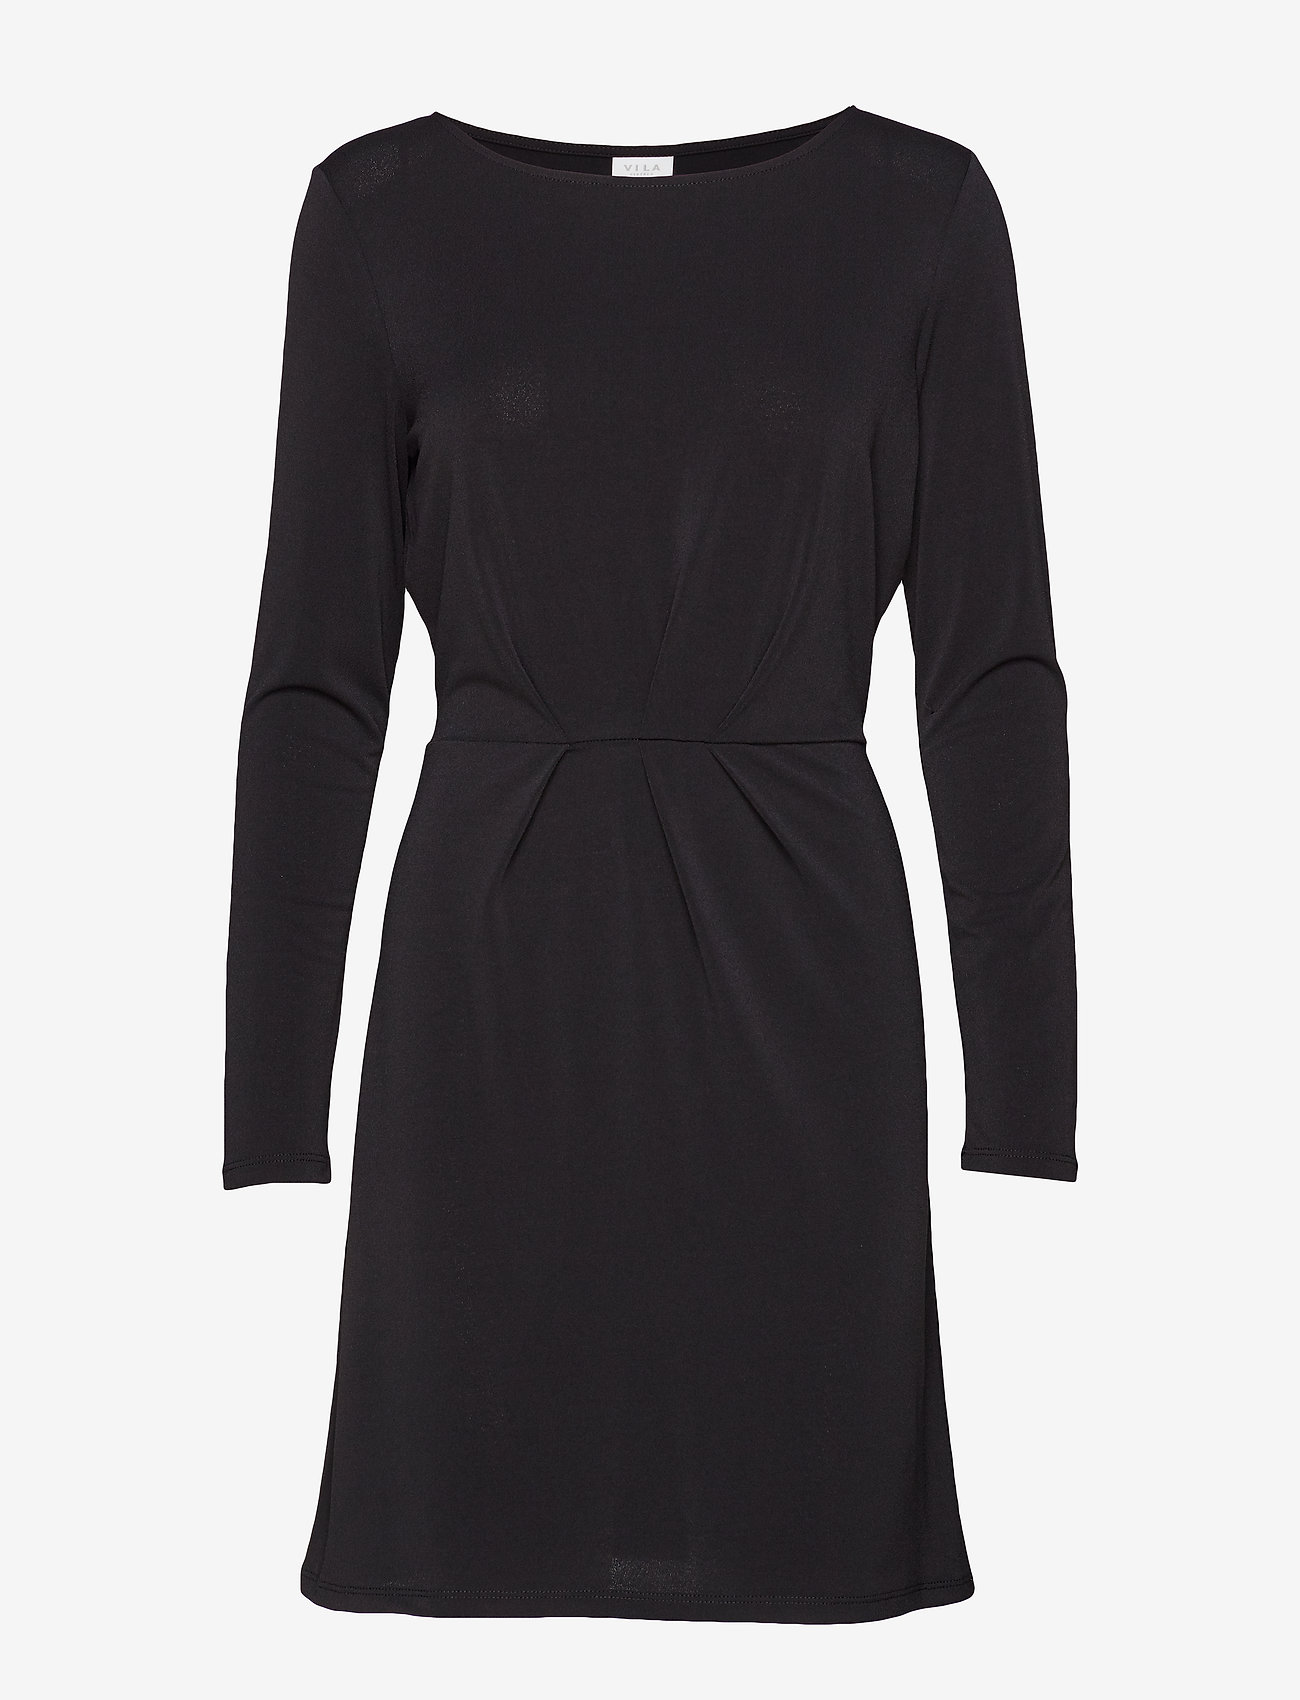 Vila - VICLASSY L/S DETAIL DRESS - NOOS - short dresses - black - 0